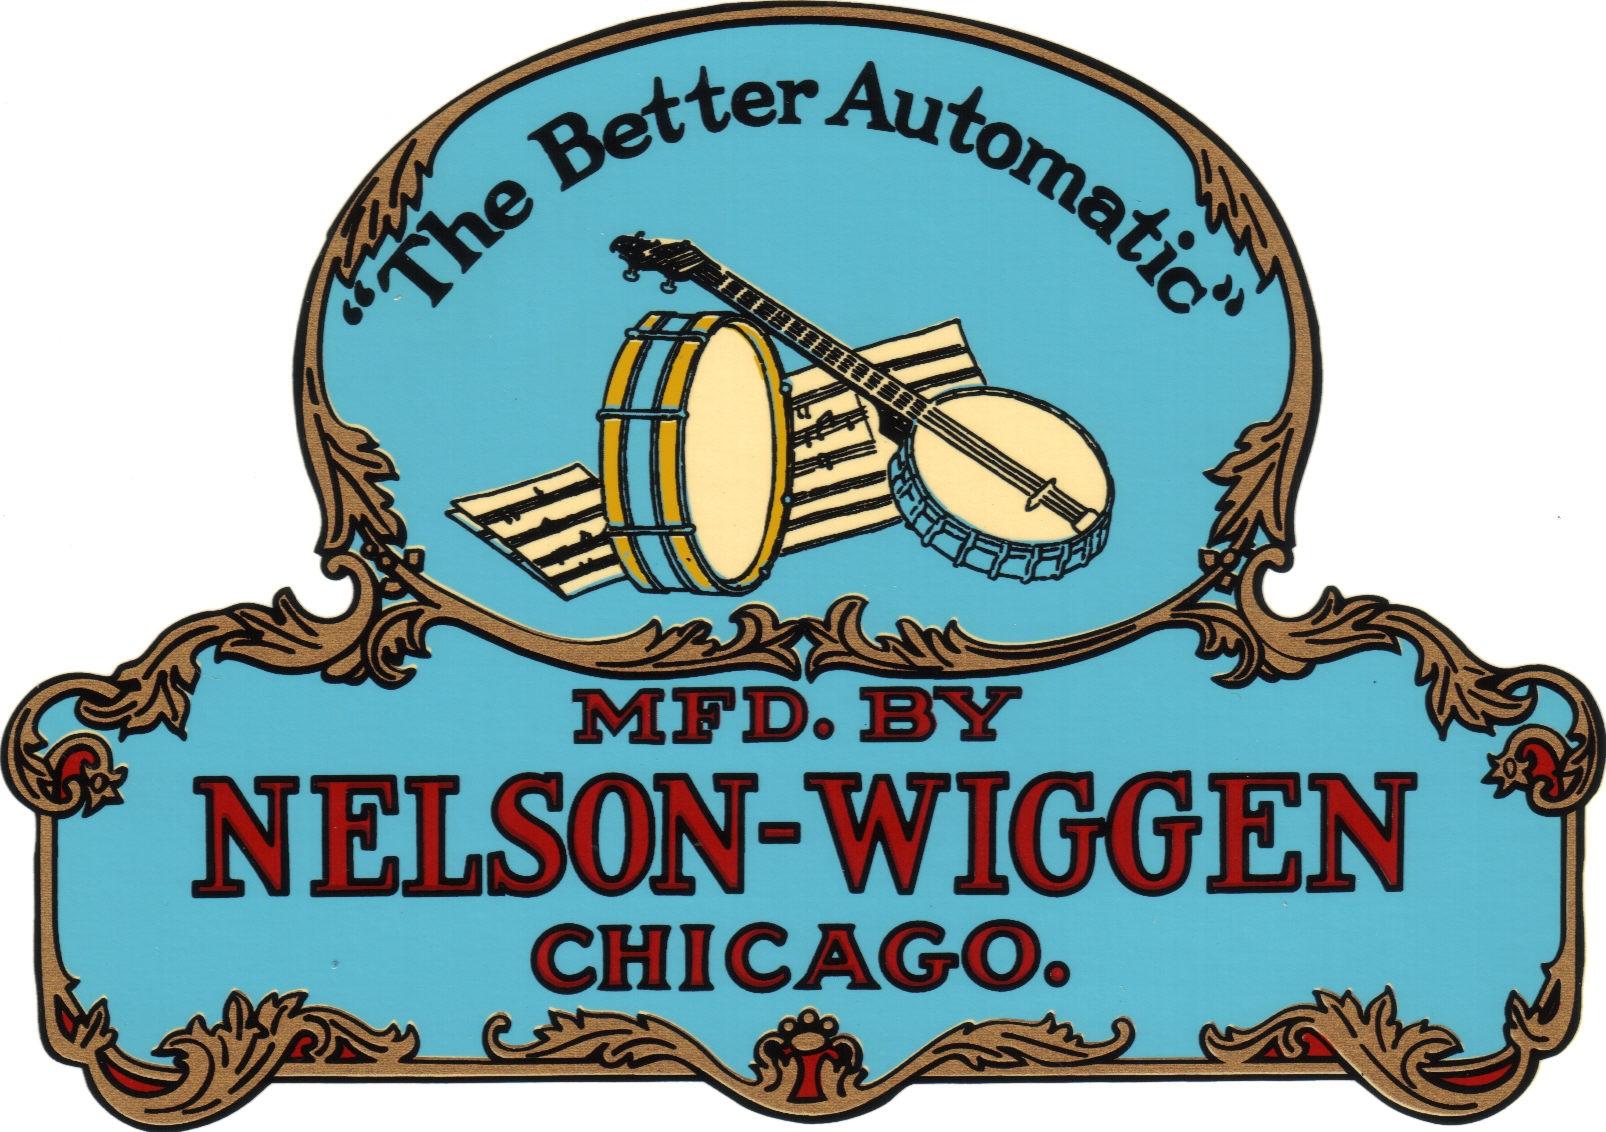 Nelson-Wiggen Decal